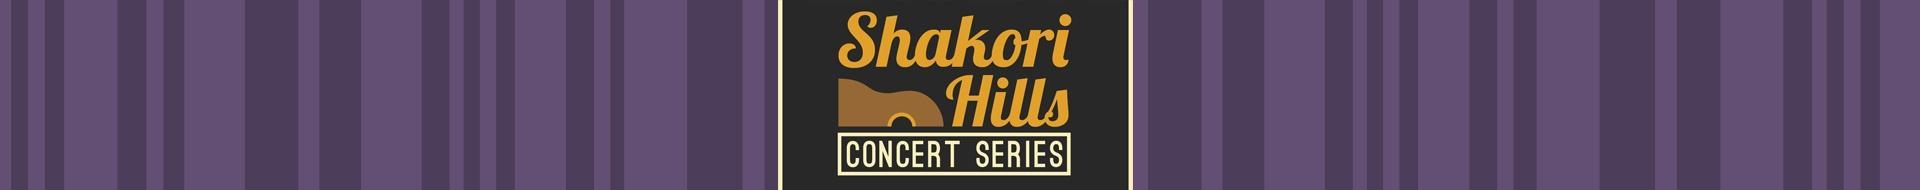 Shakori Hills Concert Series